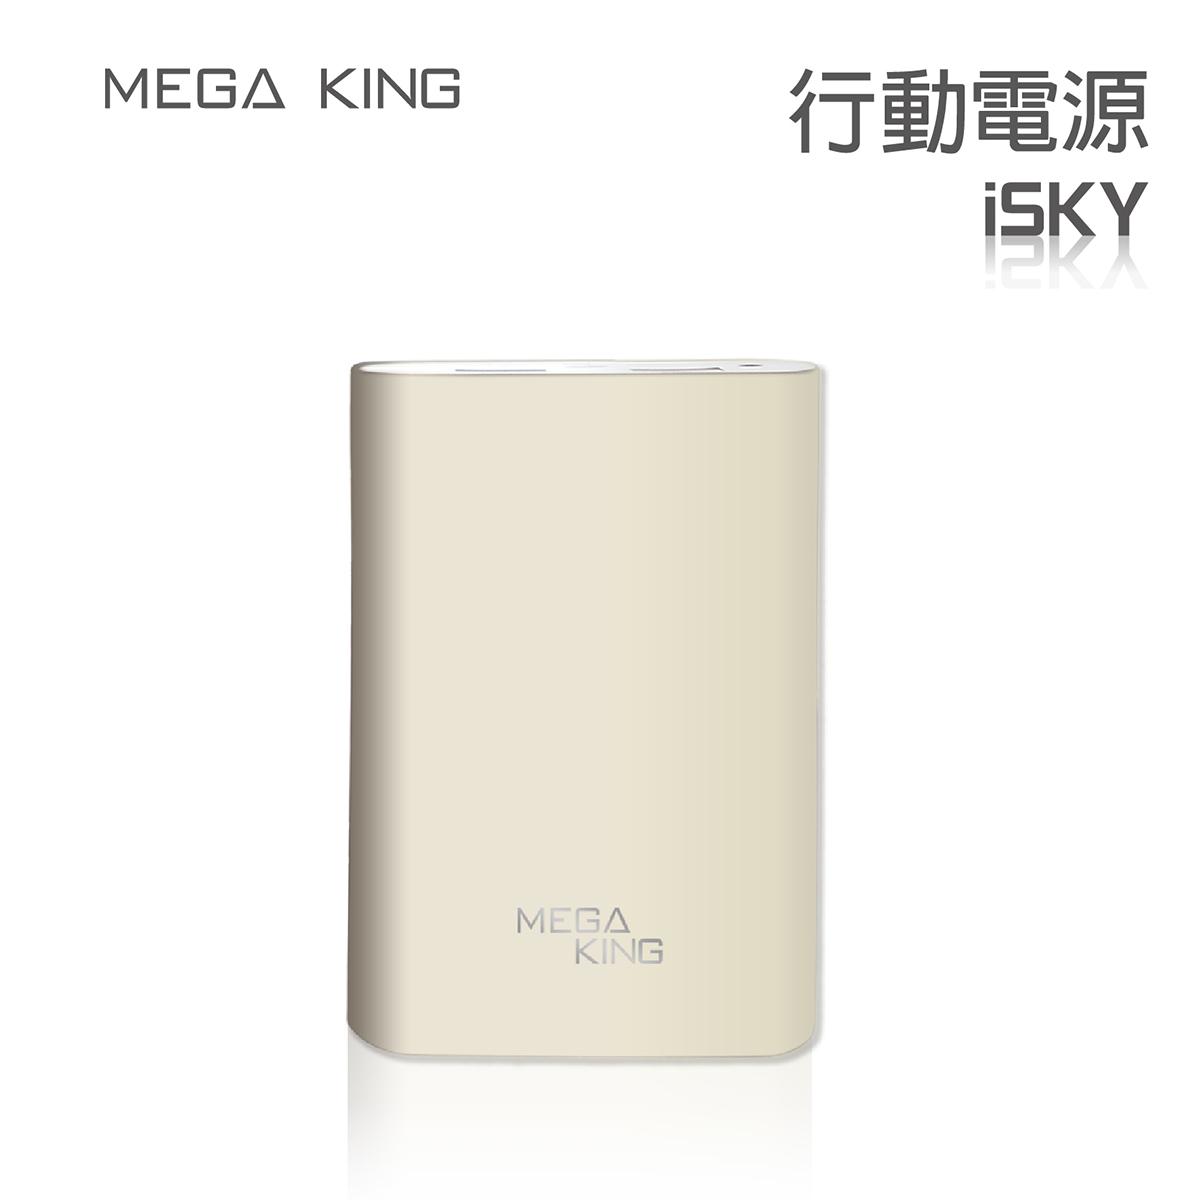 MEGA KING 隨身電源 10050 iSky 香檳鋯金(BSMI)